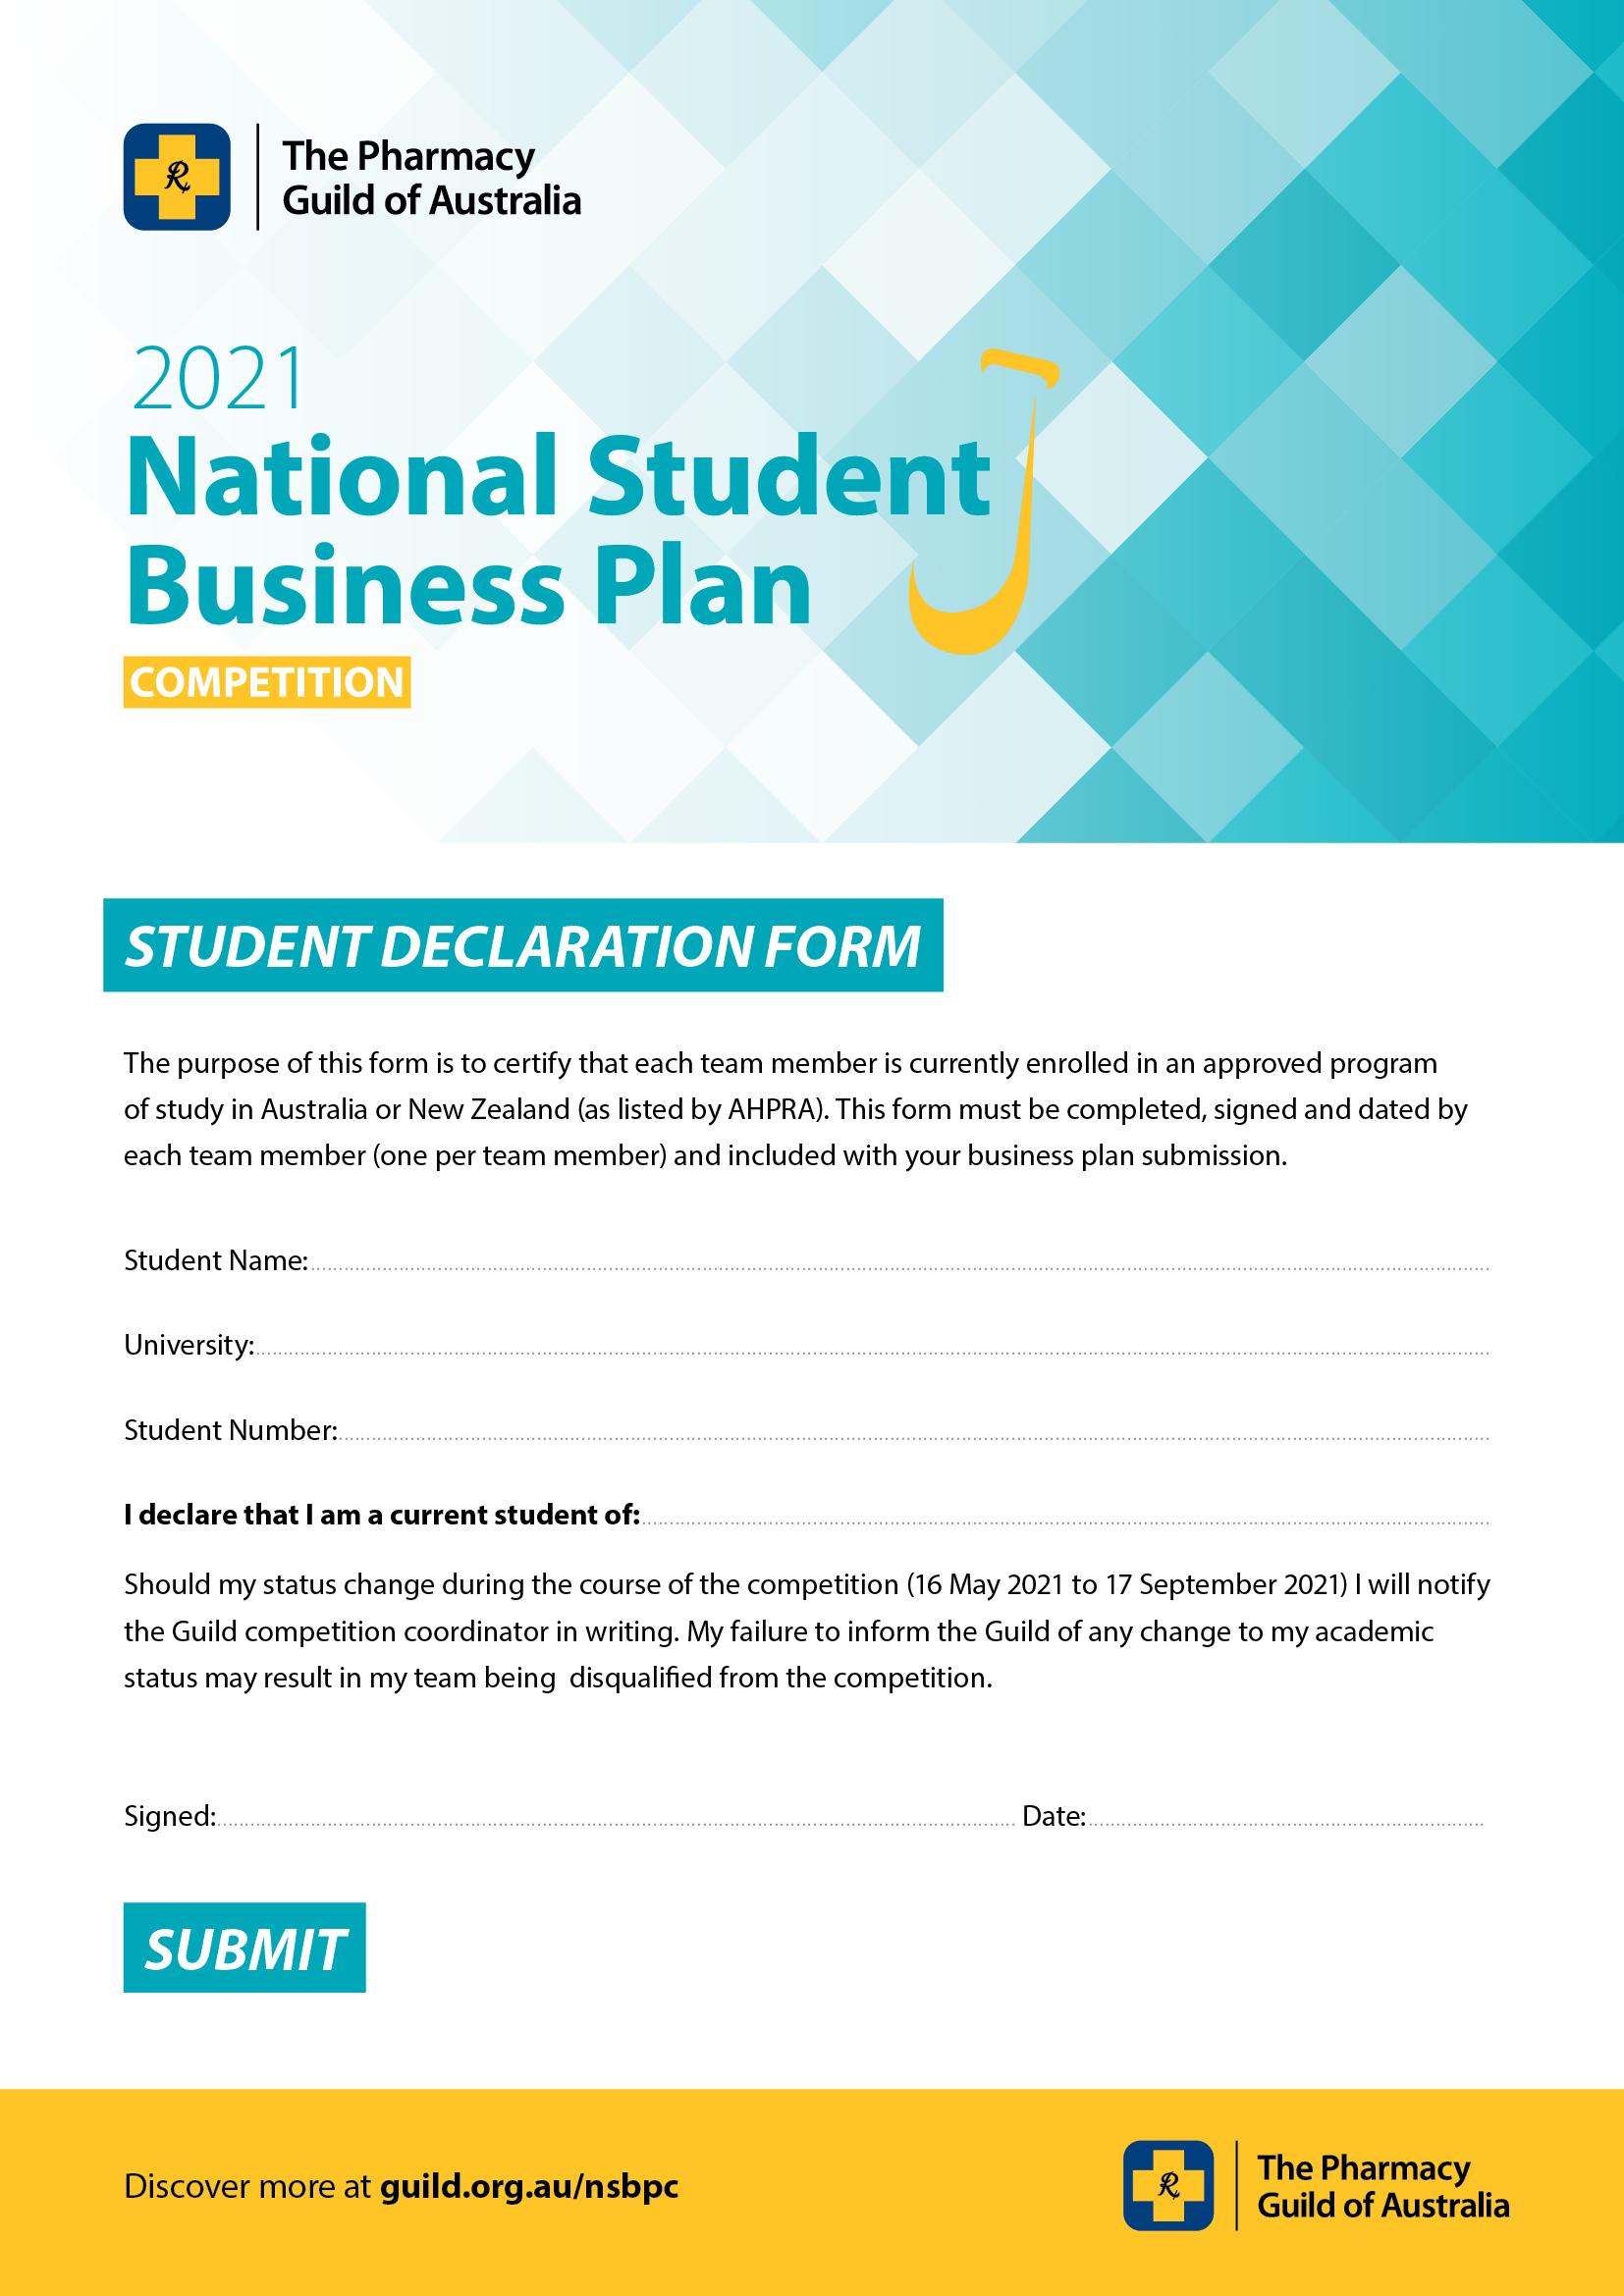 NSBPC 2021 Declaration form image